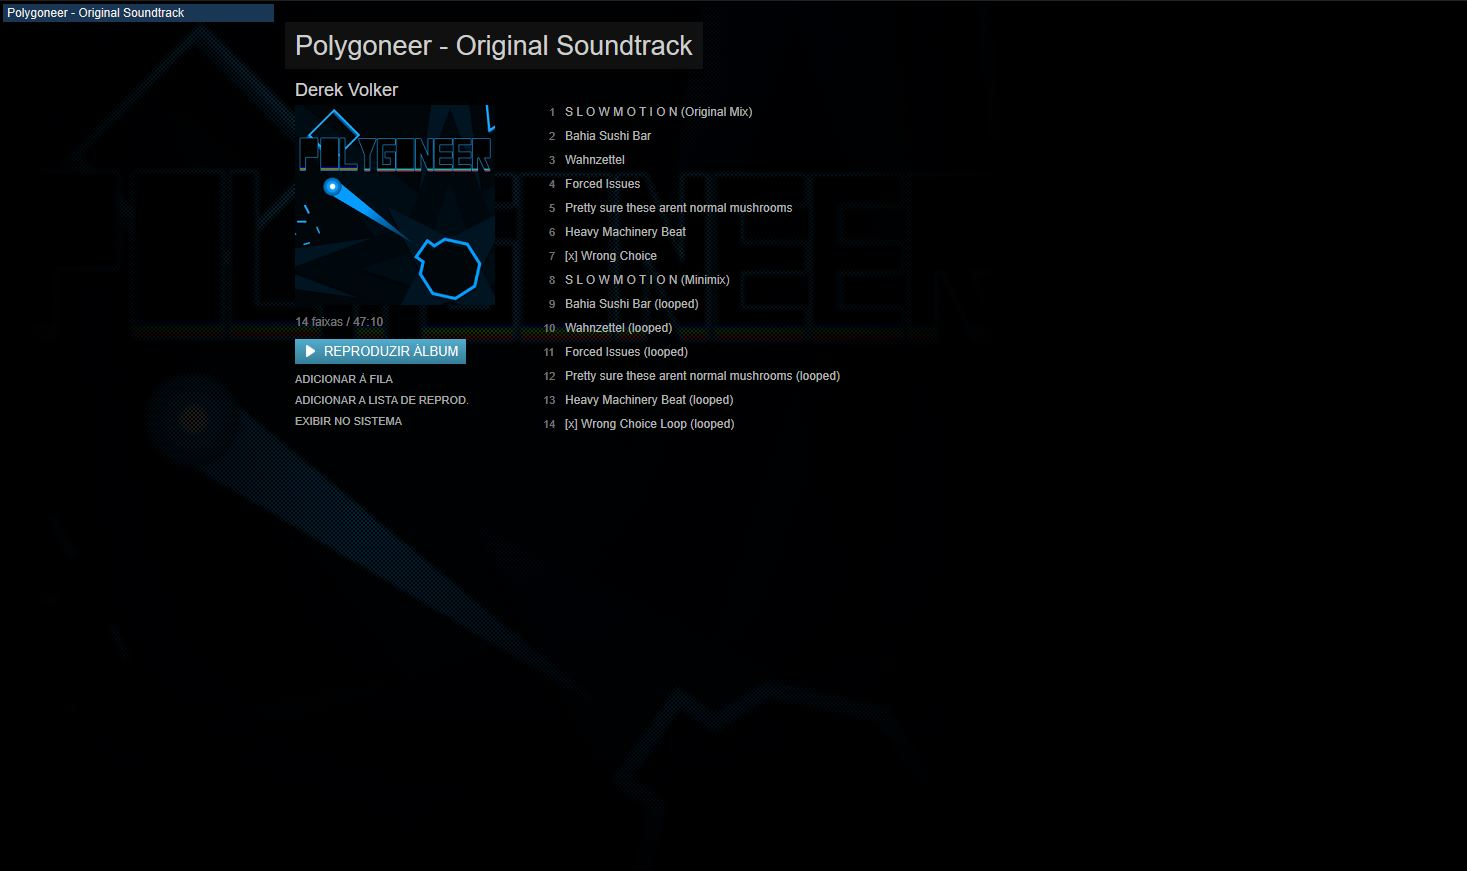 Polygoneer: Original Soundtrack screenshot